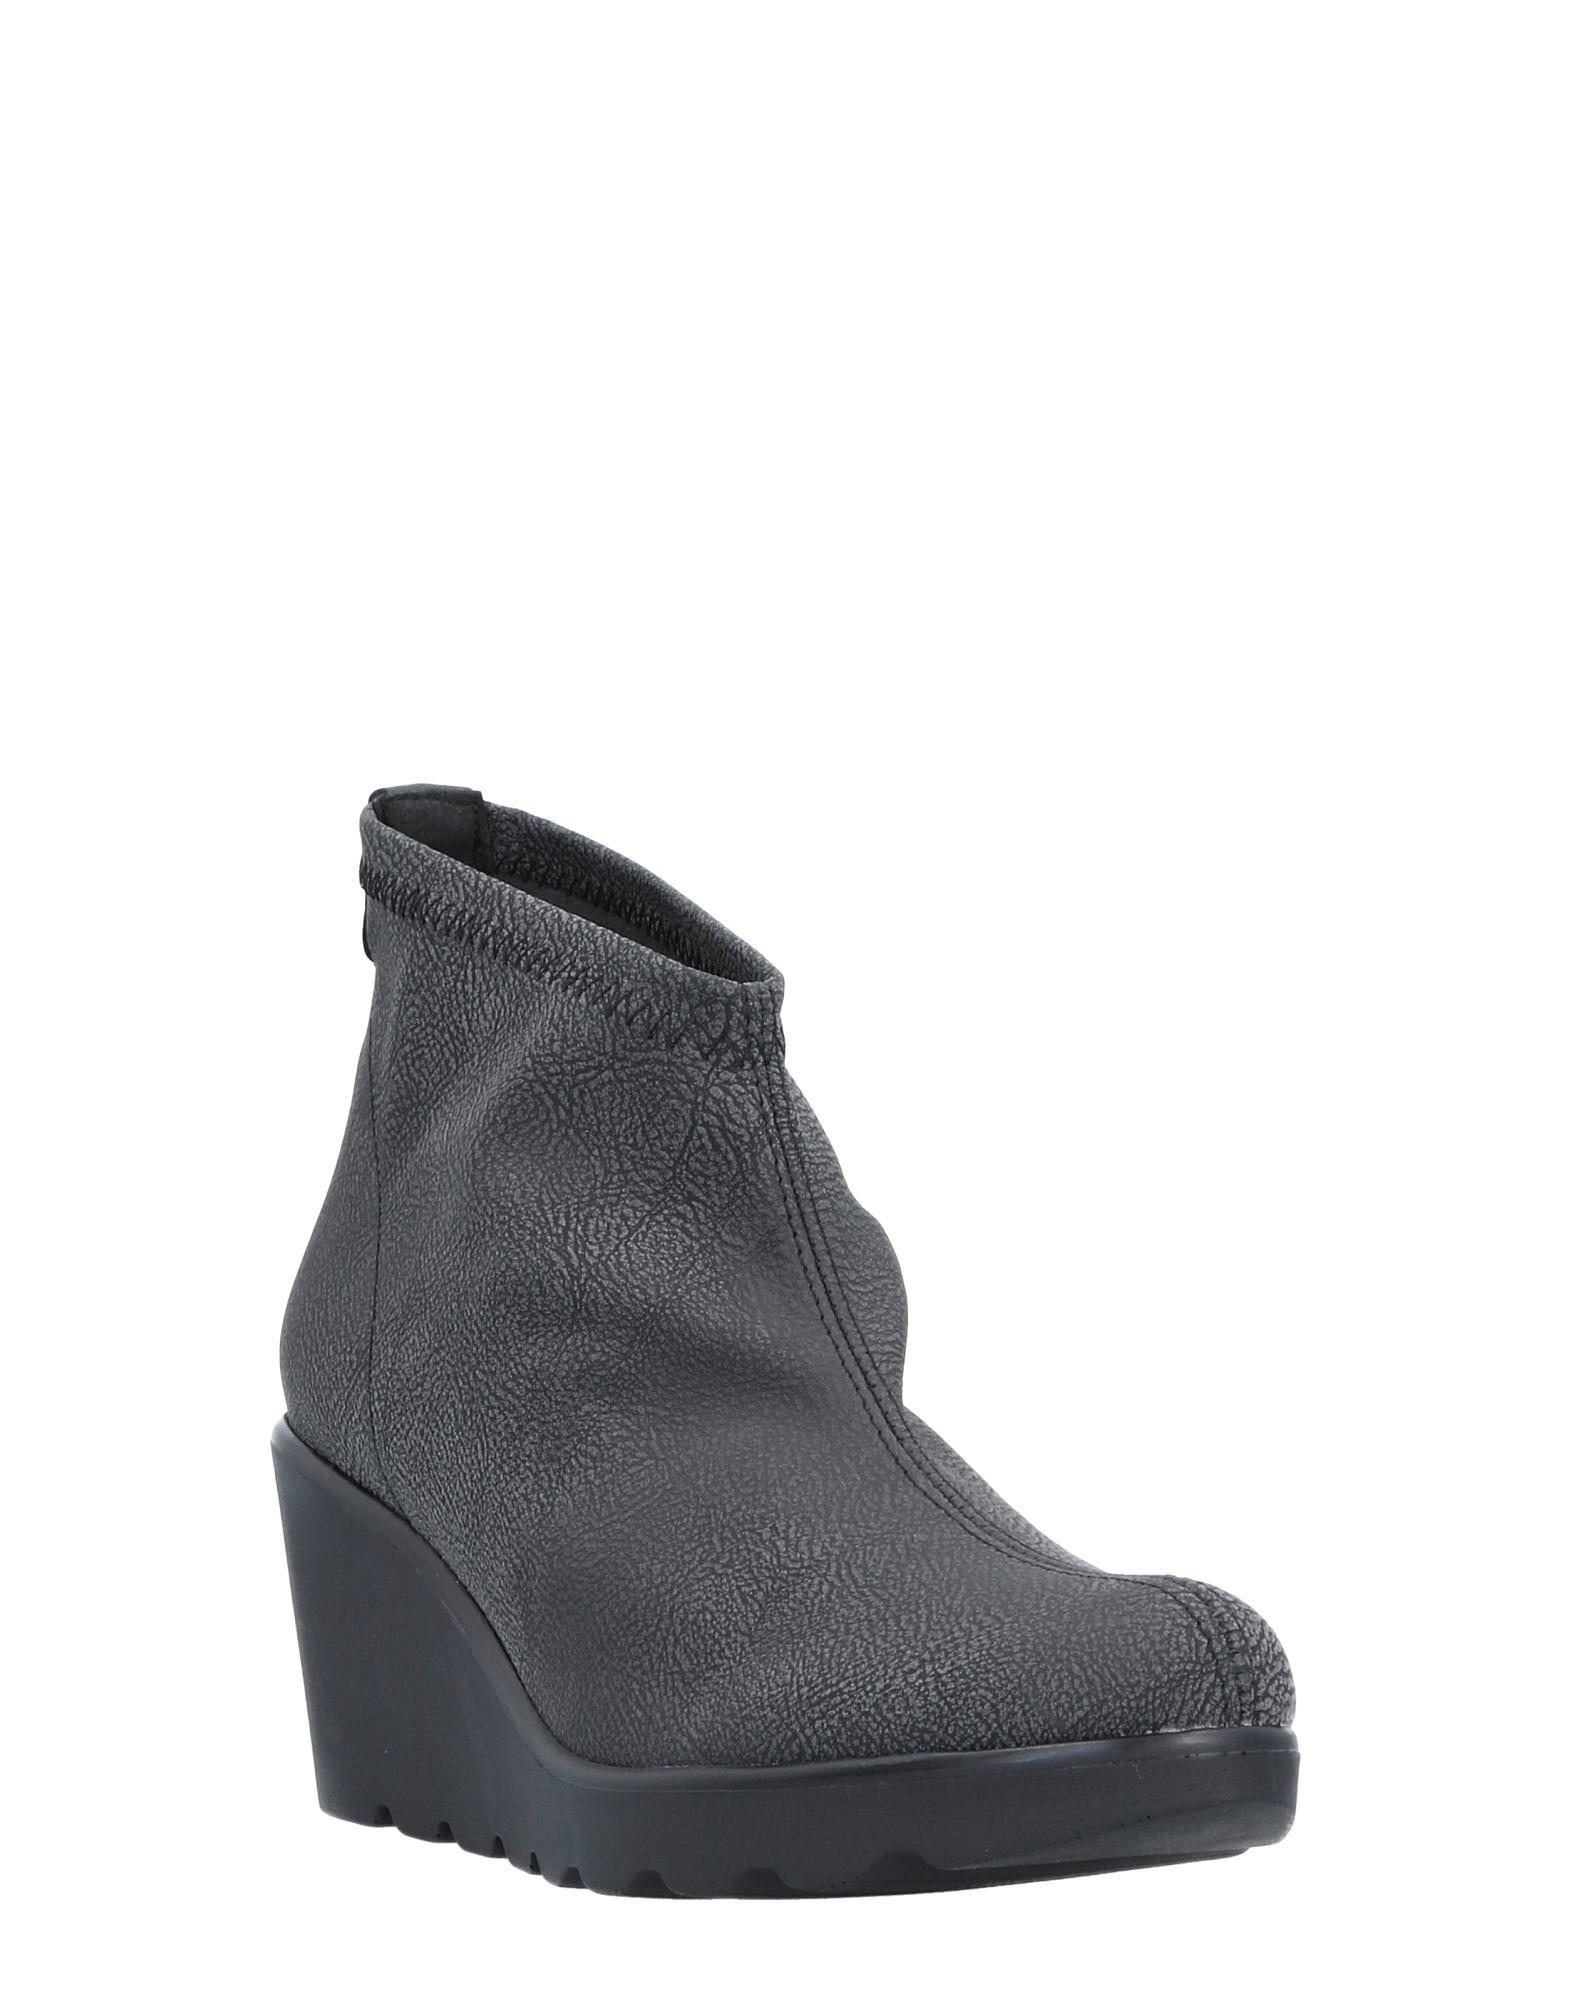 Toni Pons Stiefelette Damen beliebte  11517221WP Gute Qualität beliebte Damen Schuhe c15a14